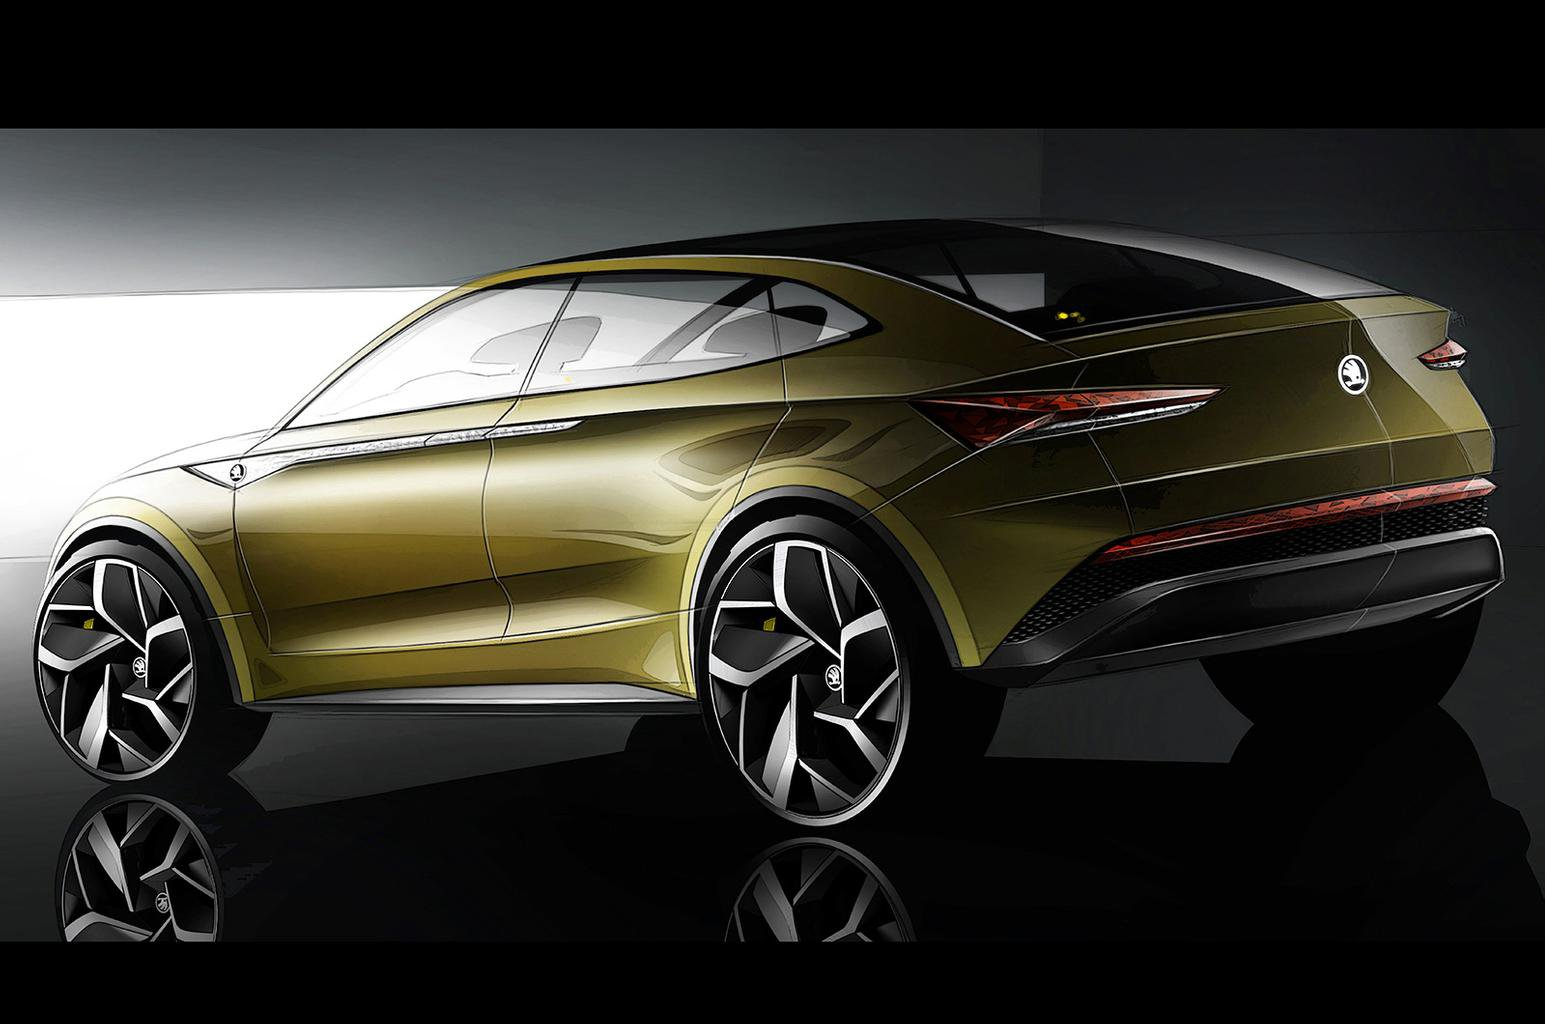 Skoda Vision E concept to arrive in 2020